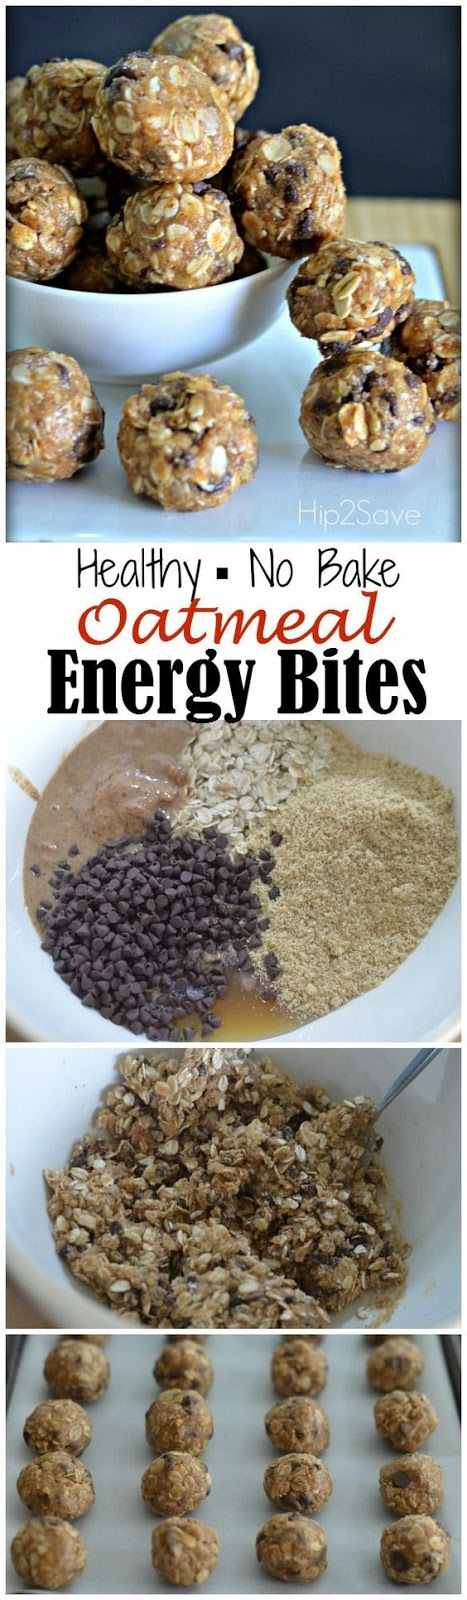 Oatmeal Energy Bites (Easy No-Bake Snack) #recipes #healthyideas #healthyrecipes #snackideas #healthysnackideas #food #foodporn #healthy #yummy #instafood #foodie #delicious #dinner #breakfast #dessert #yum #lunch #vegan #cake #eatclean #homemade #diet #healthyfood #cleaneating #foodstagram